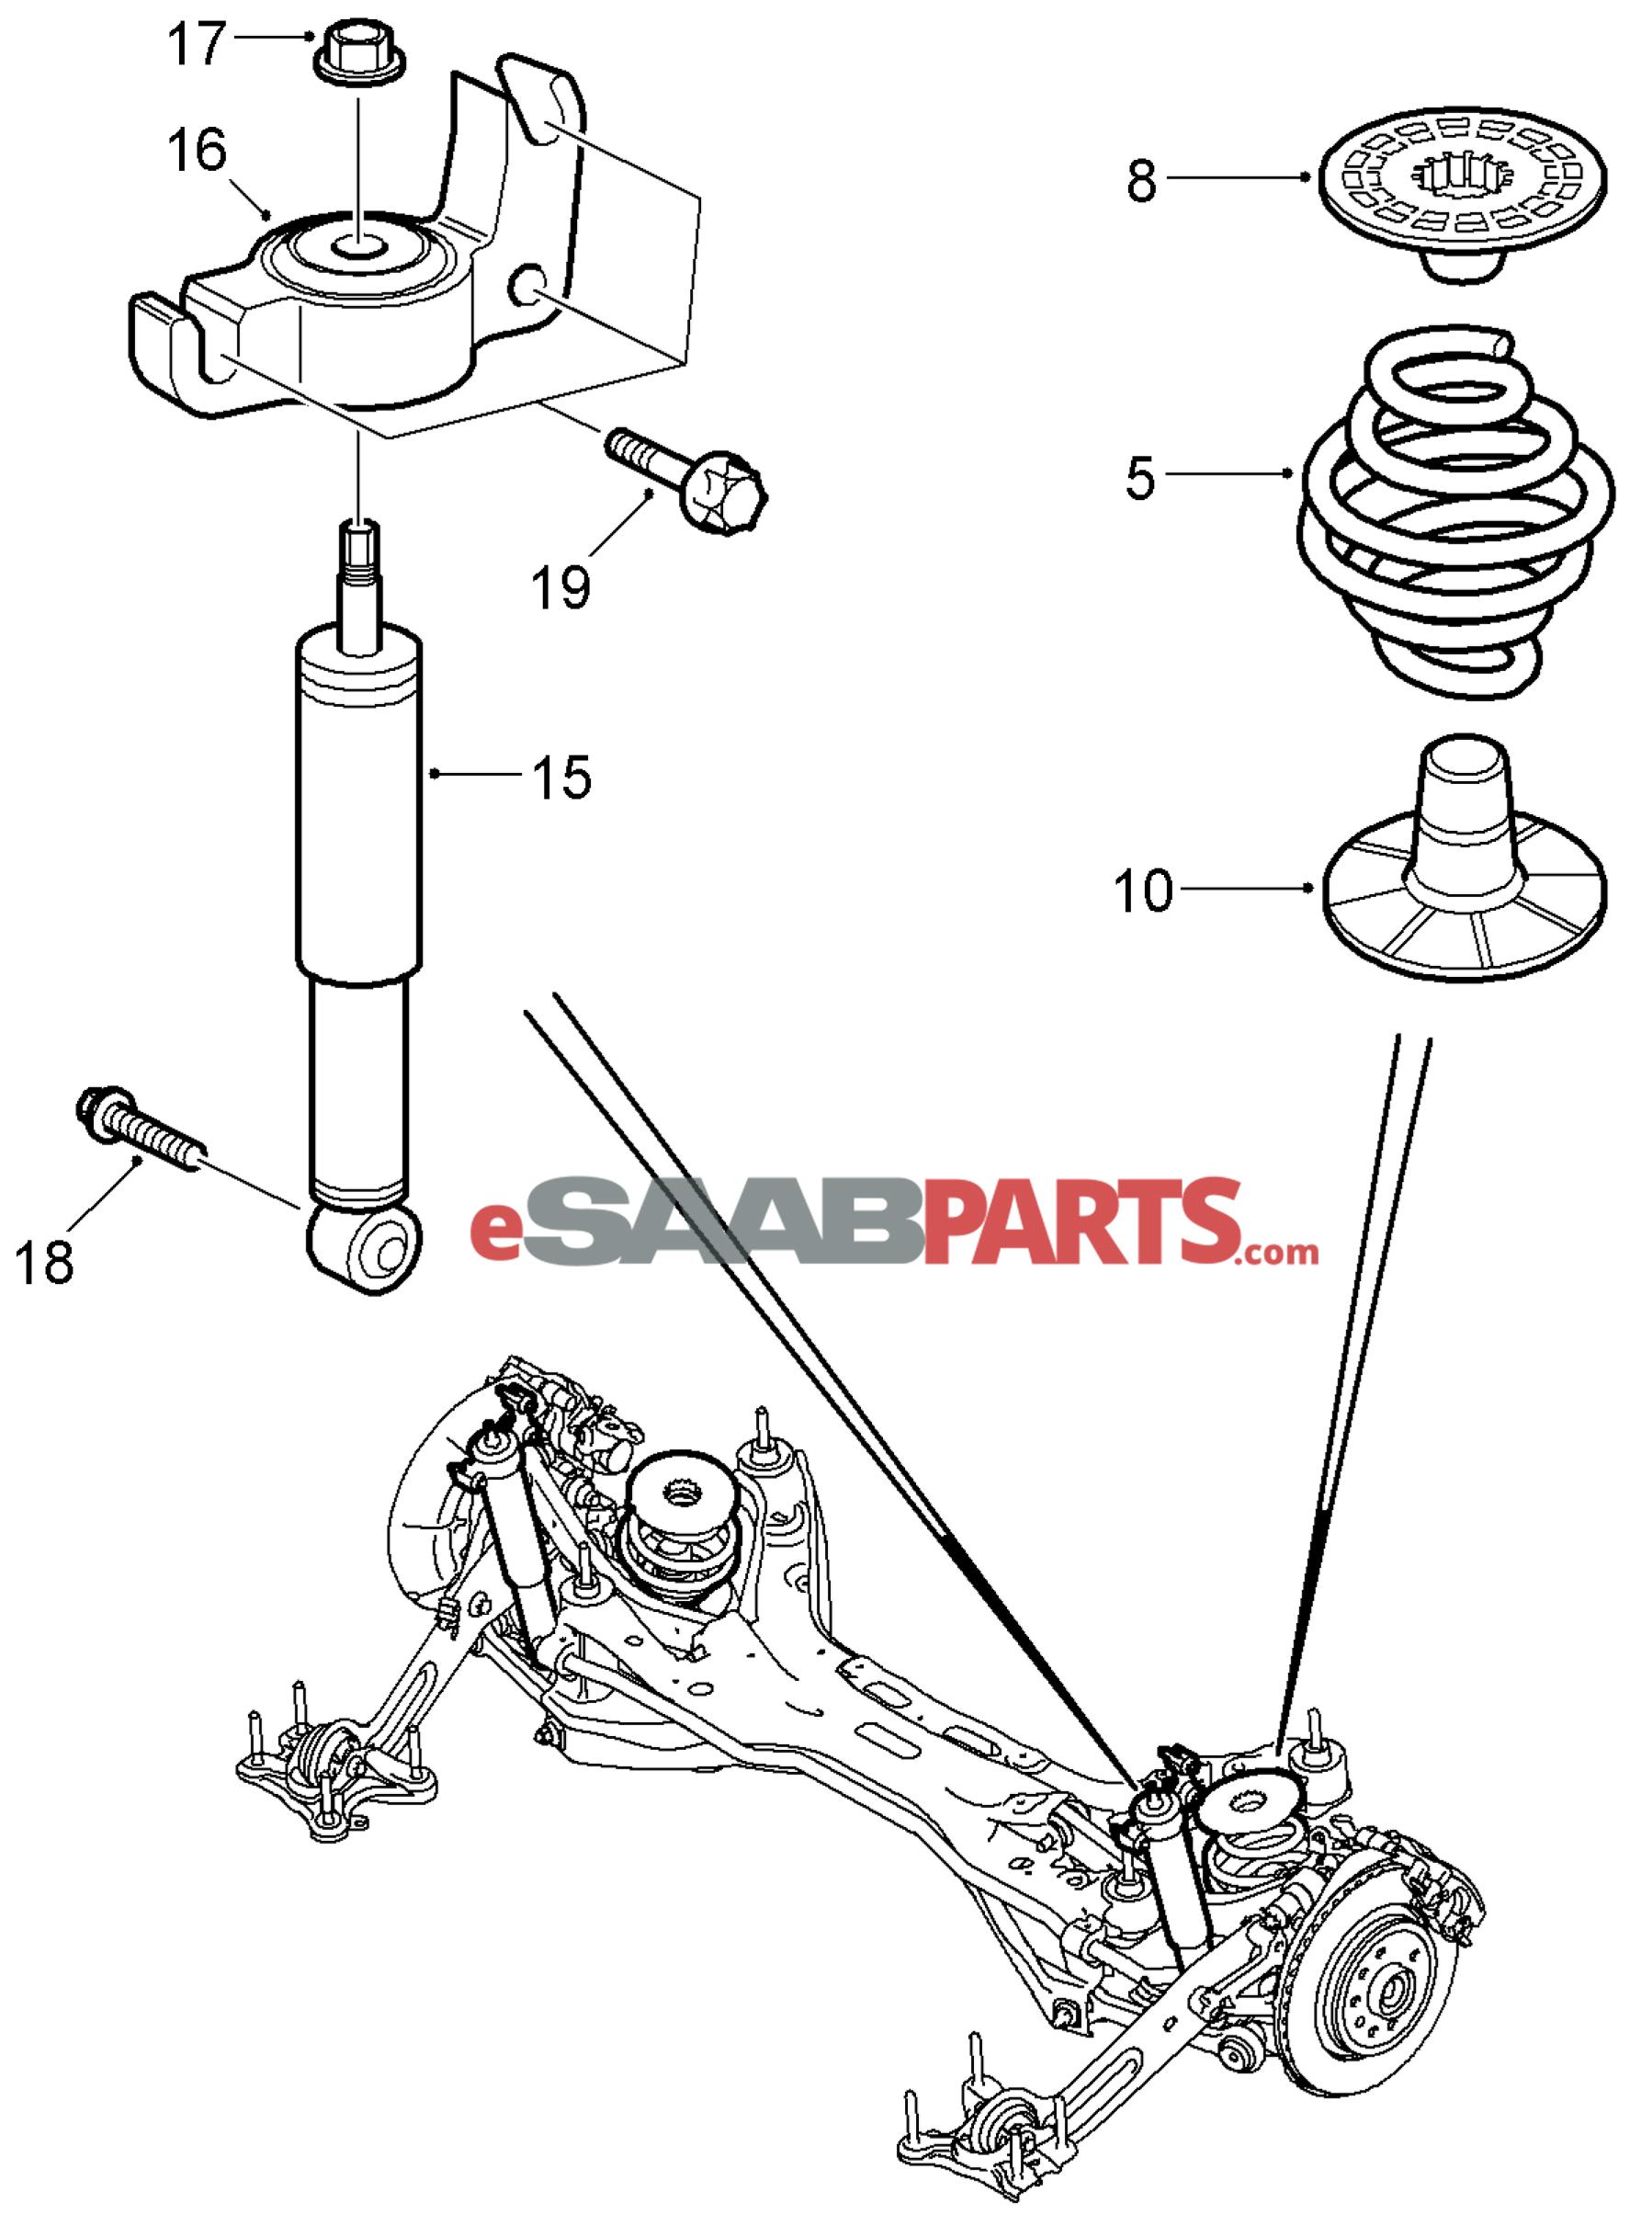 Saab Rear Spring Code 11